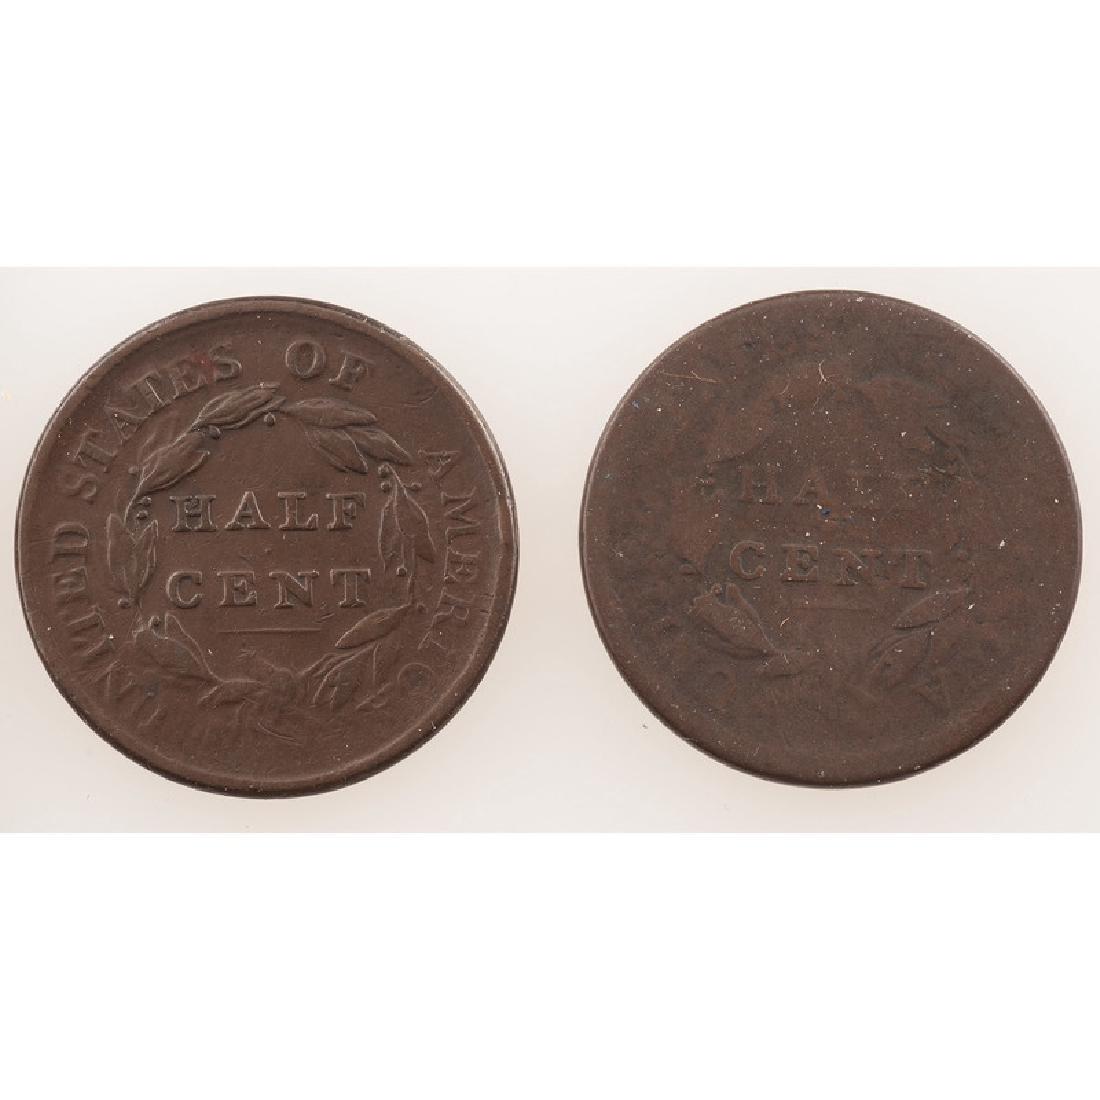 United States Half Cents 1809-1810 - 2